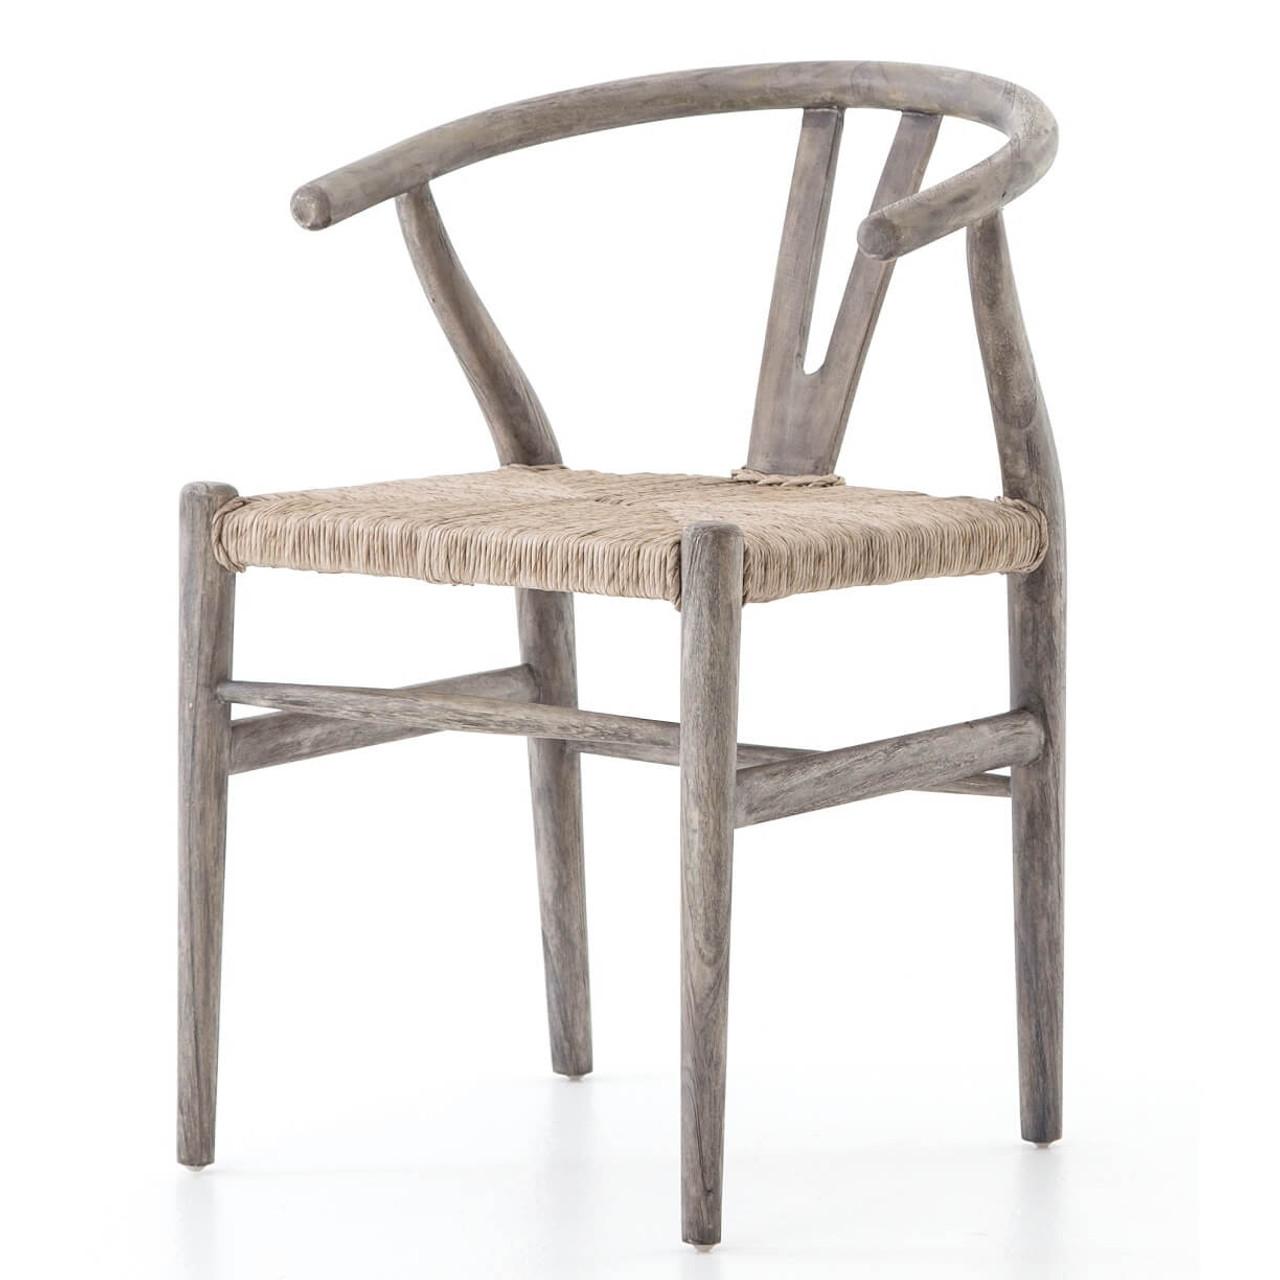 Muestra Grey Teak Wood Woven Wicker Dining Chair Zin Home Fourhands